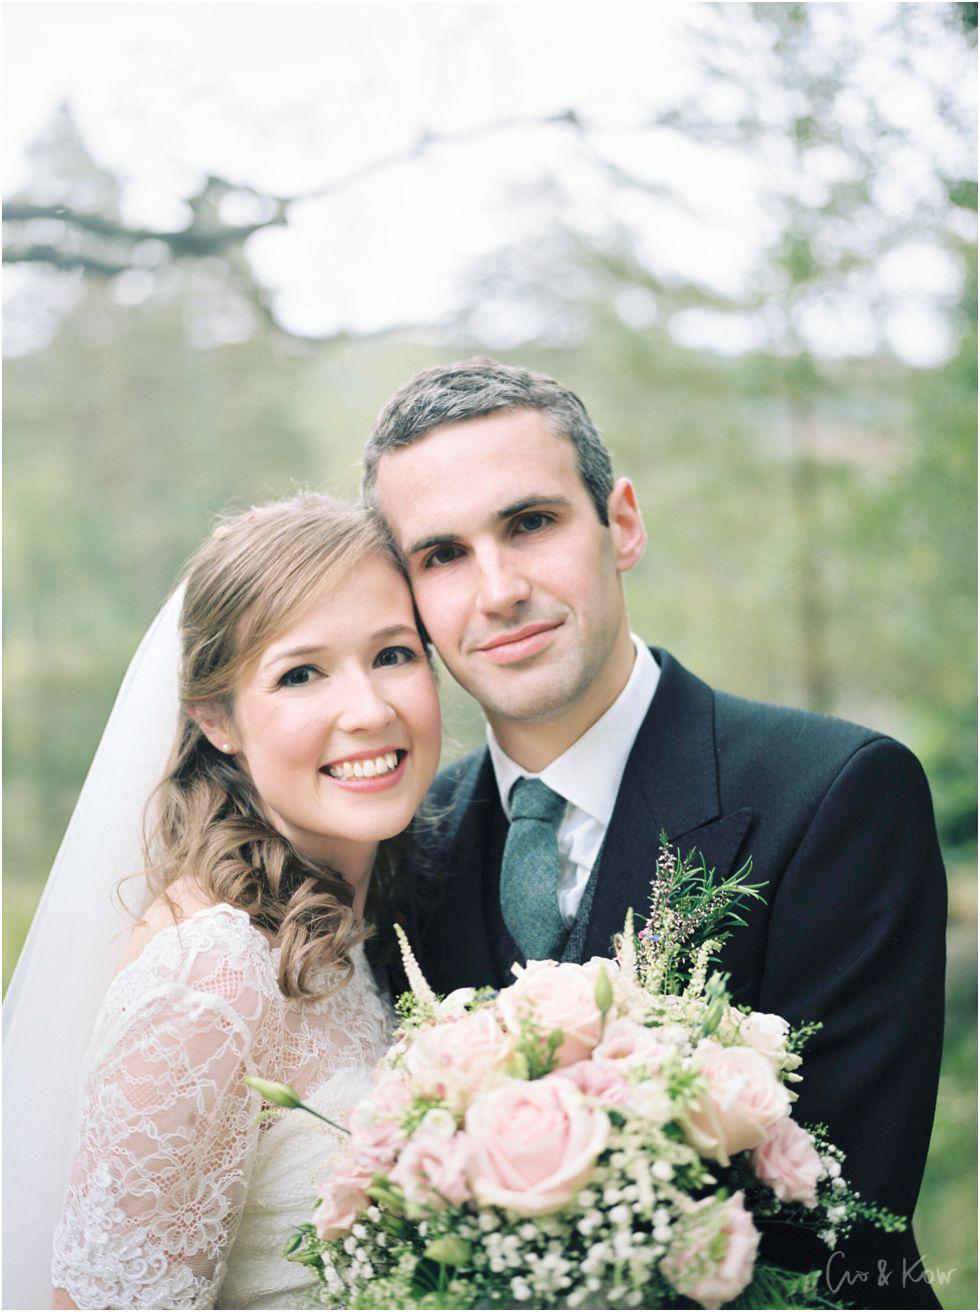 Sally-and-James-wedding-photography-Glen-Tanar-11.jpg